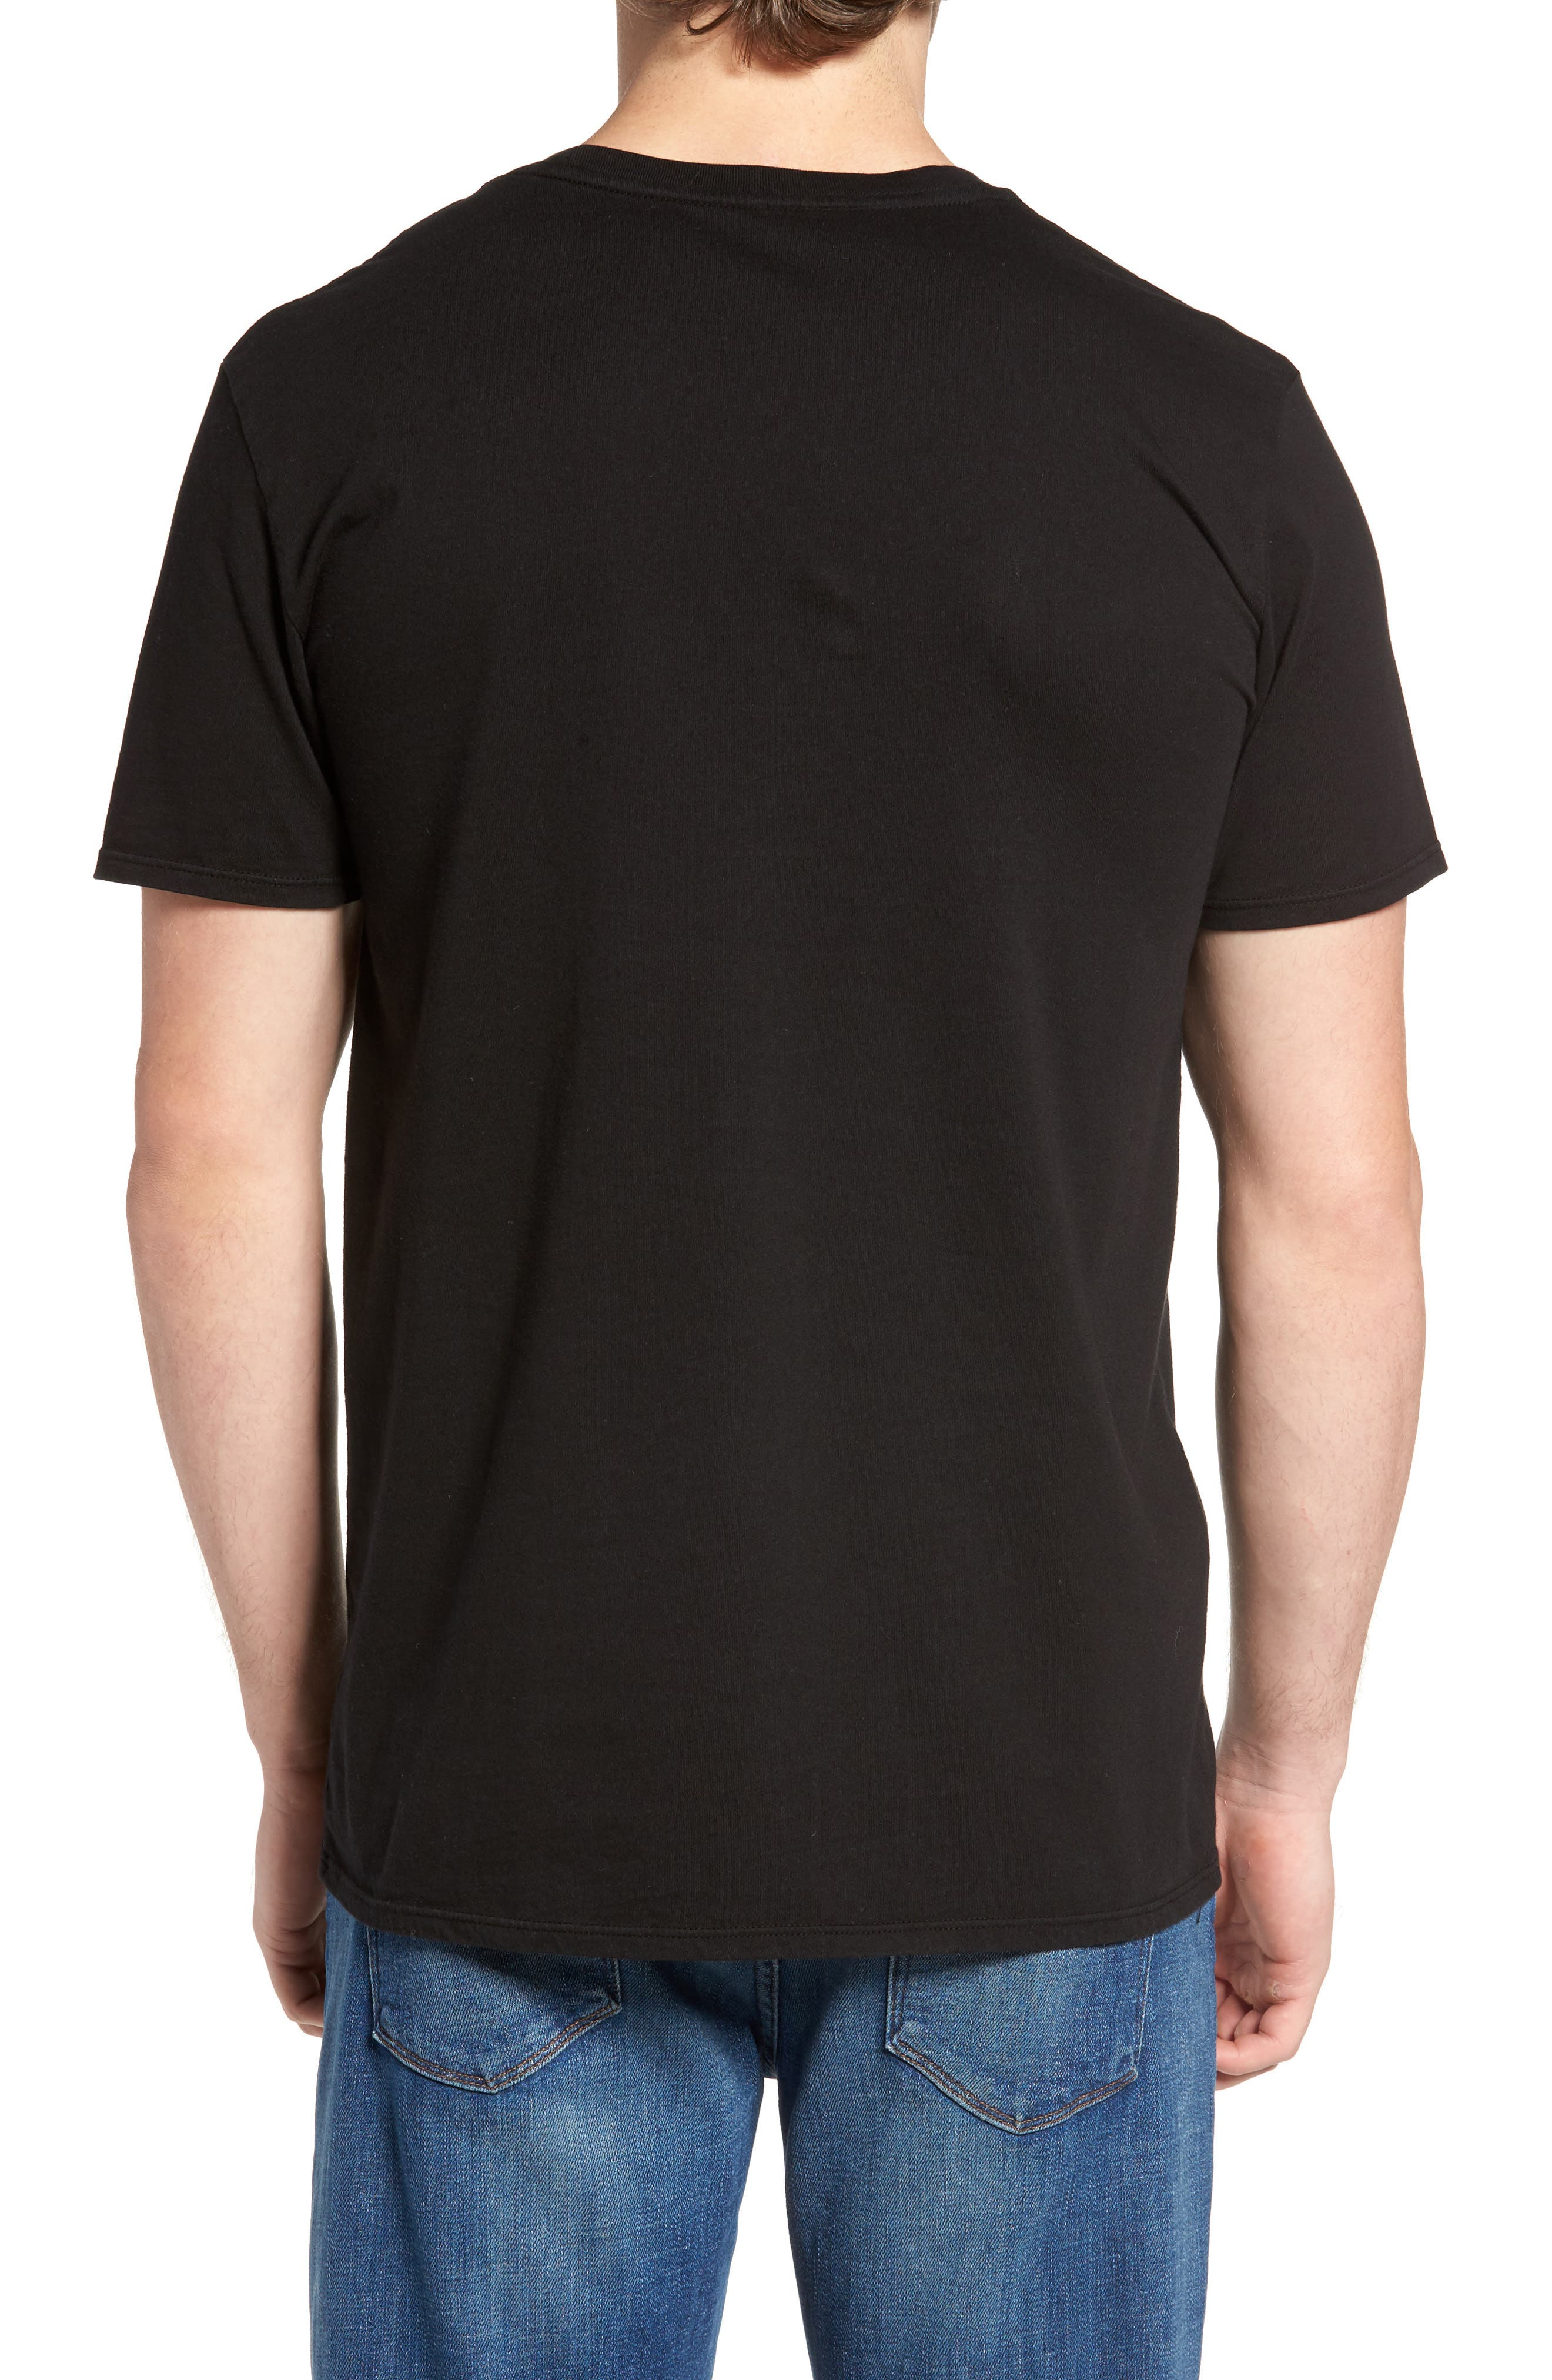 ORIGINAL PAPERBACKS,                             Pocket T-Shirt,                             Alternate thumbnail 2, color,                             001